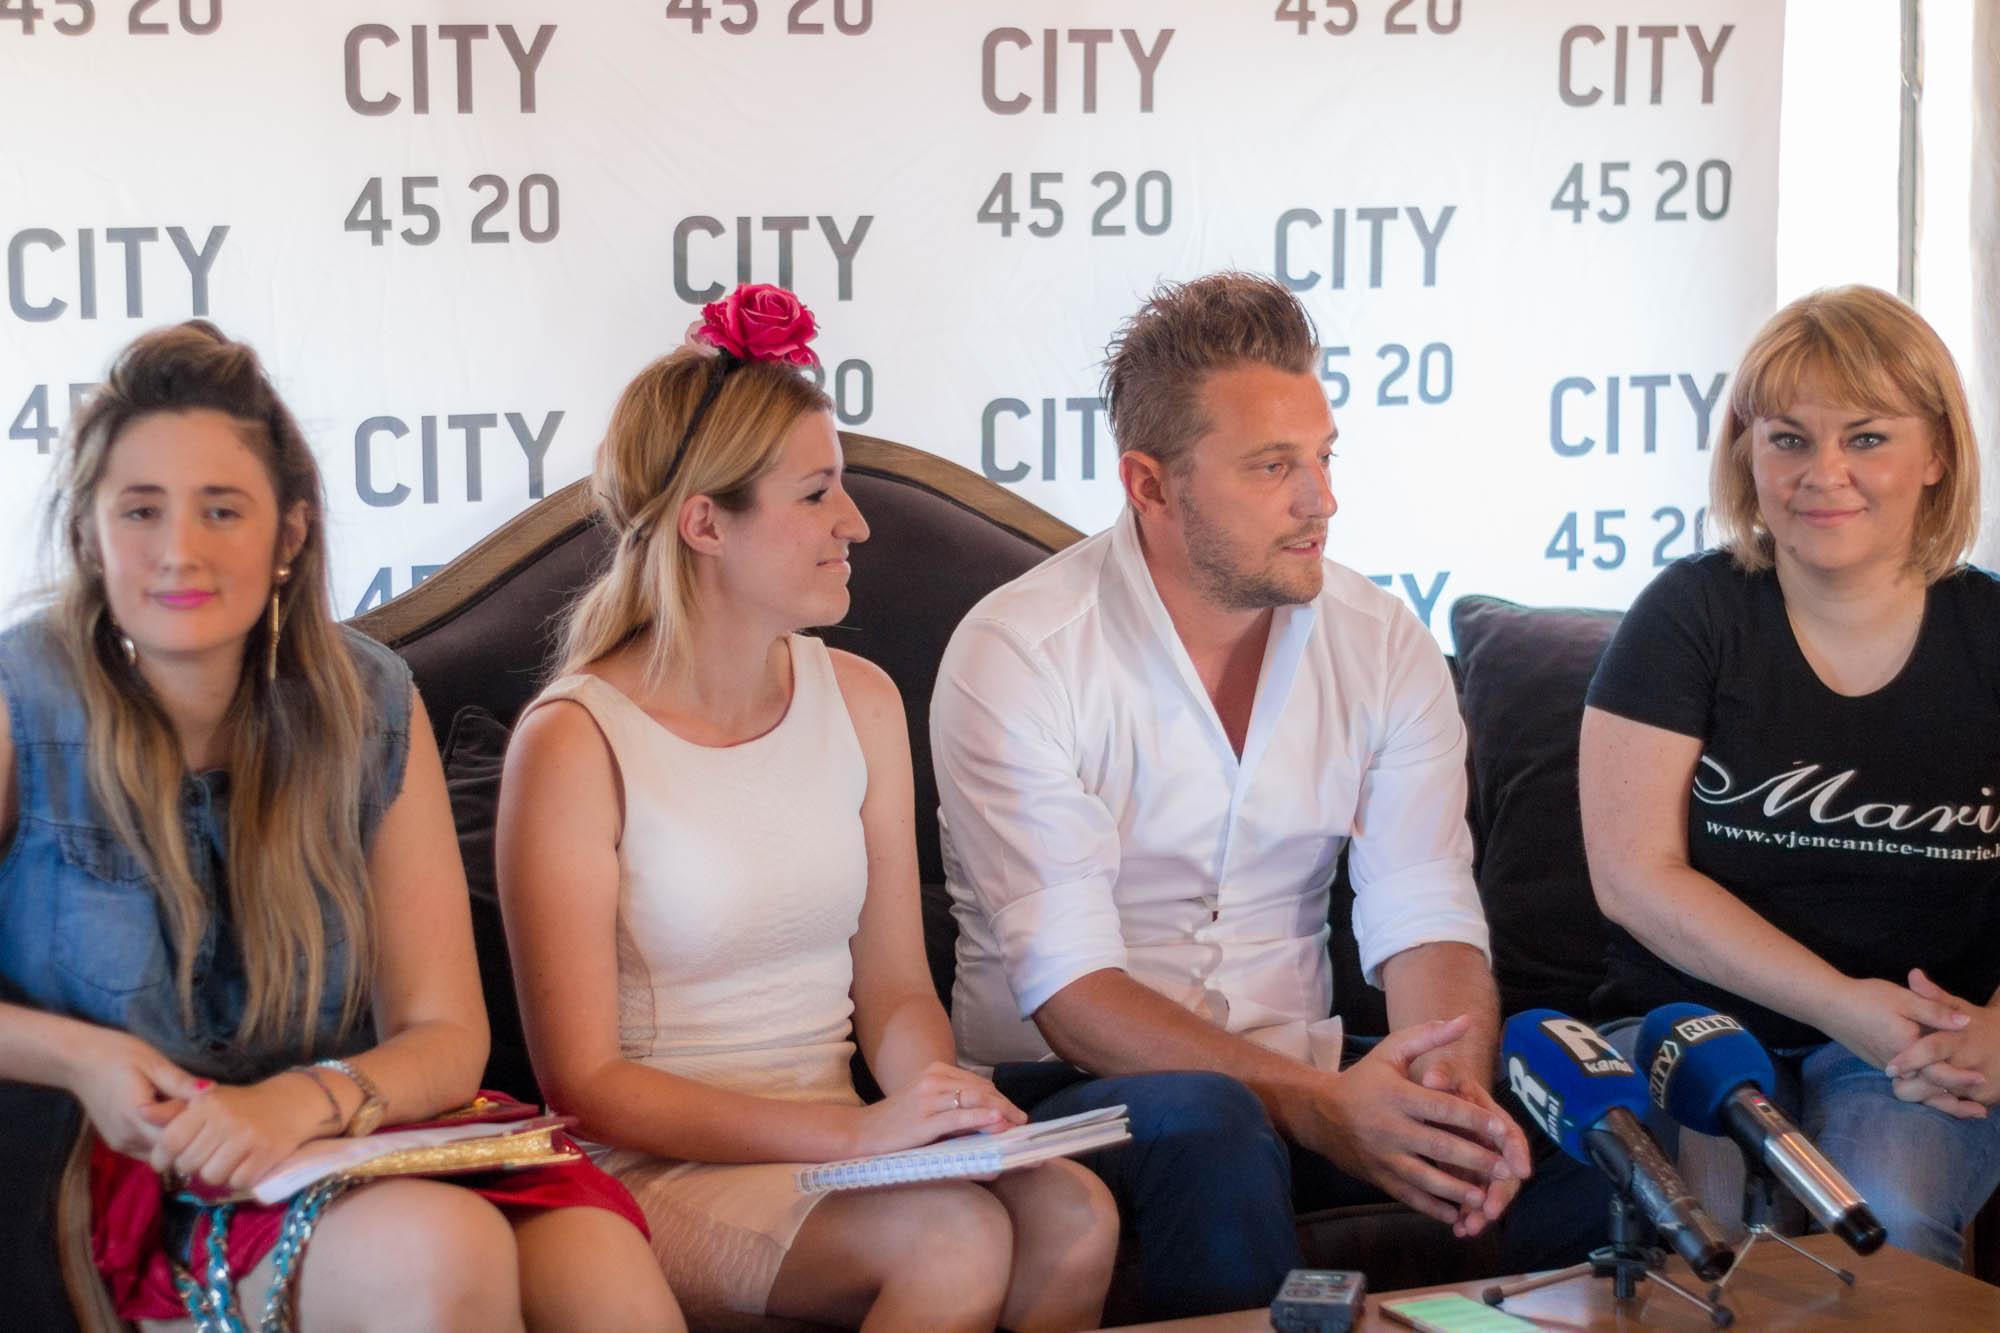 Danas Je Održana Konferencija Za Medije: CITY 45 20 Powered By Womanary